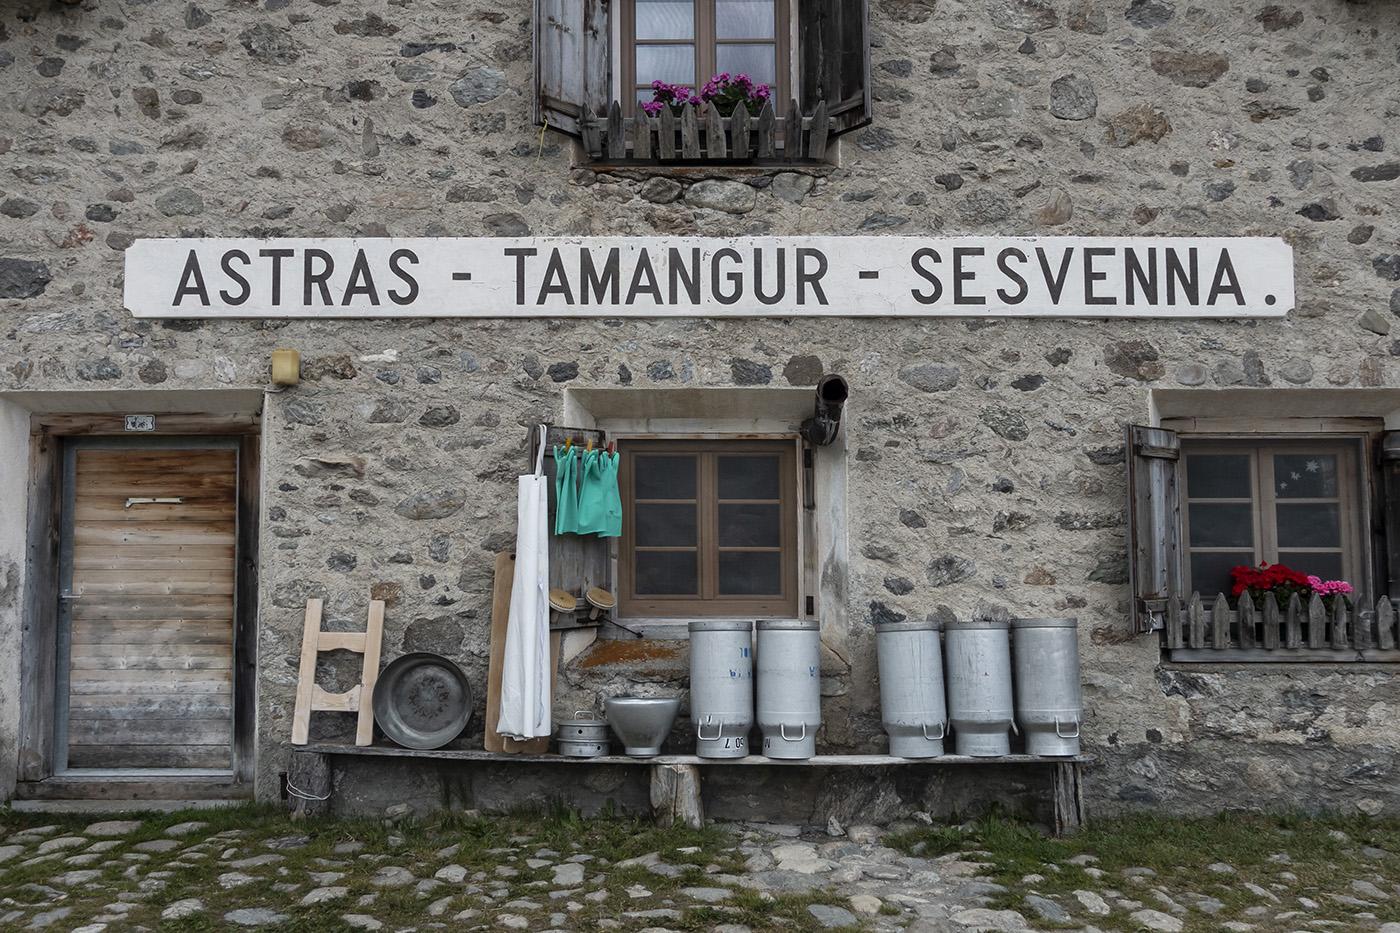 Wanderwoche Val Muestair, Alp Astras, 12. - 19. Juli 2020 © Valerie Chetelat